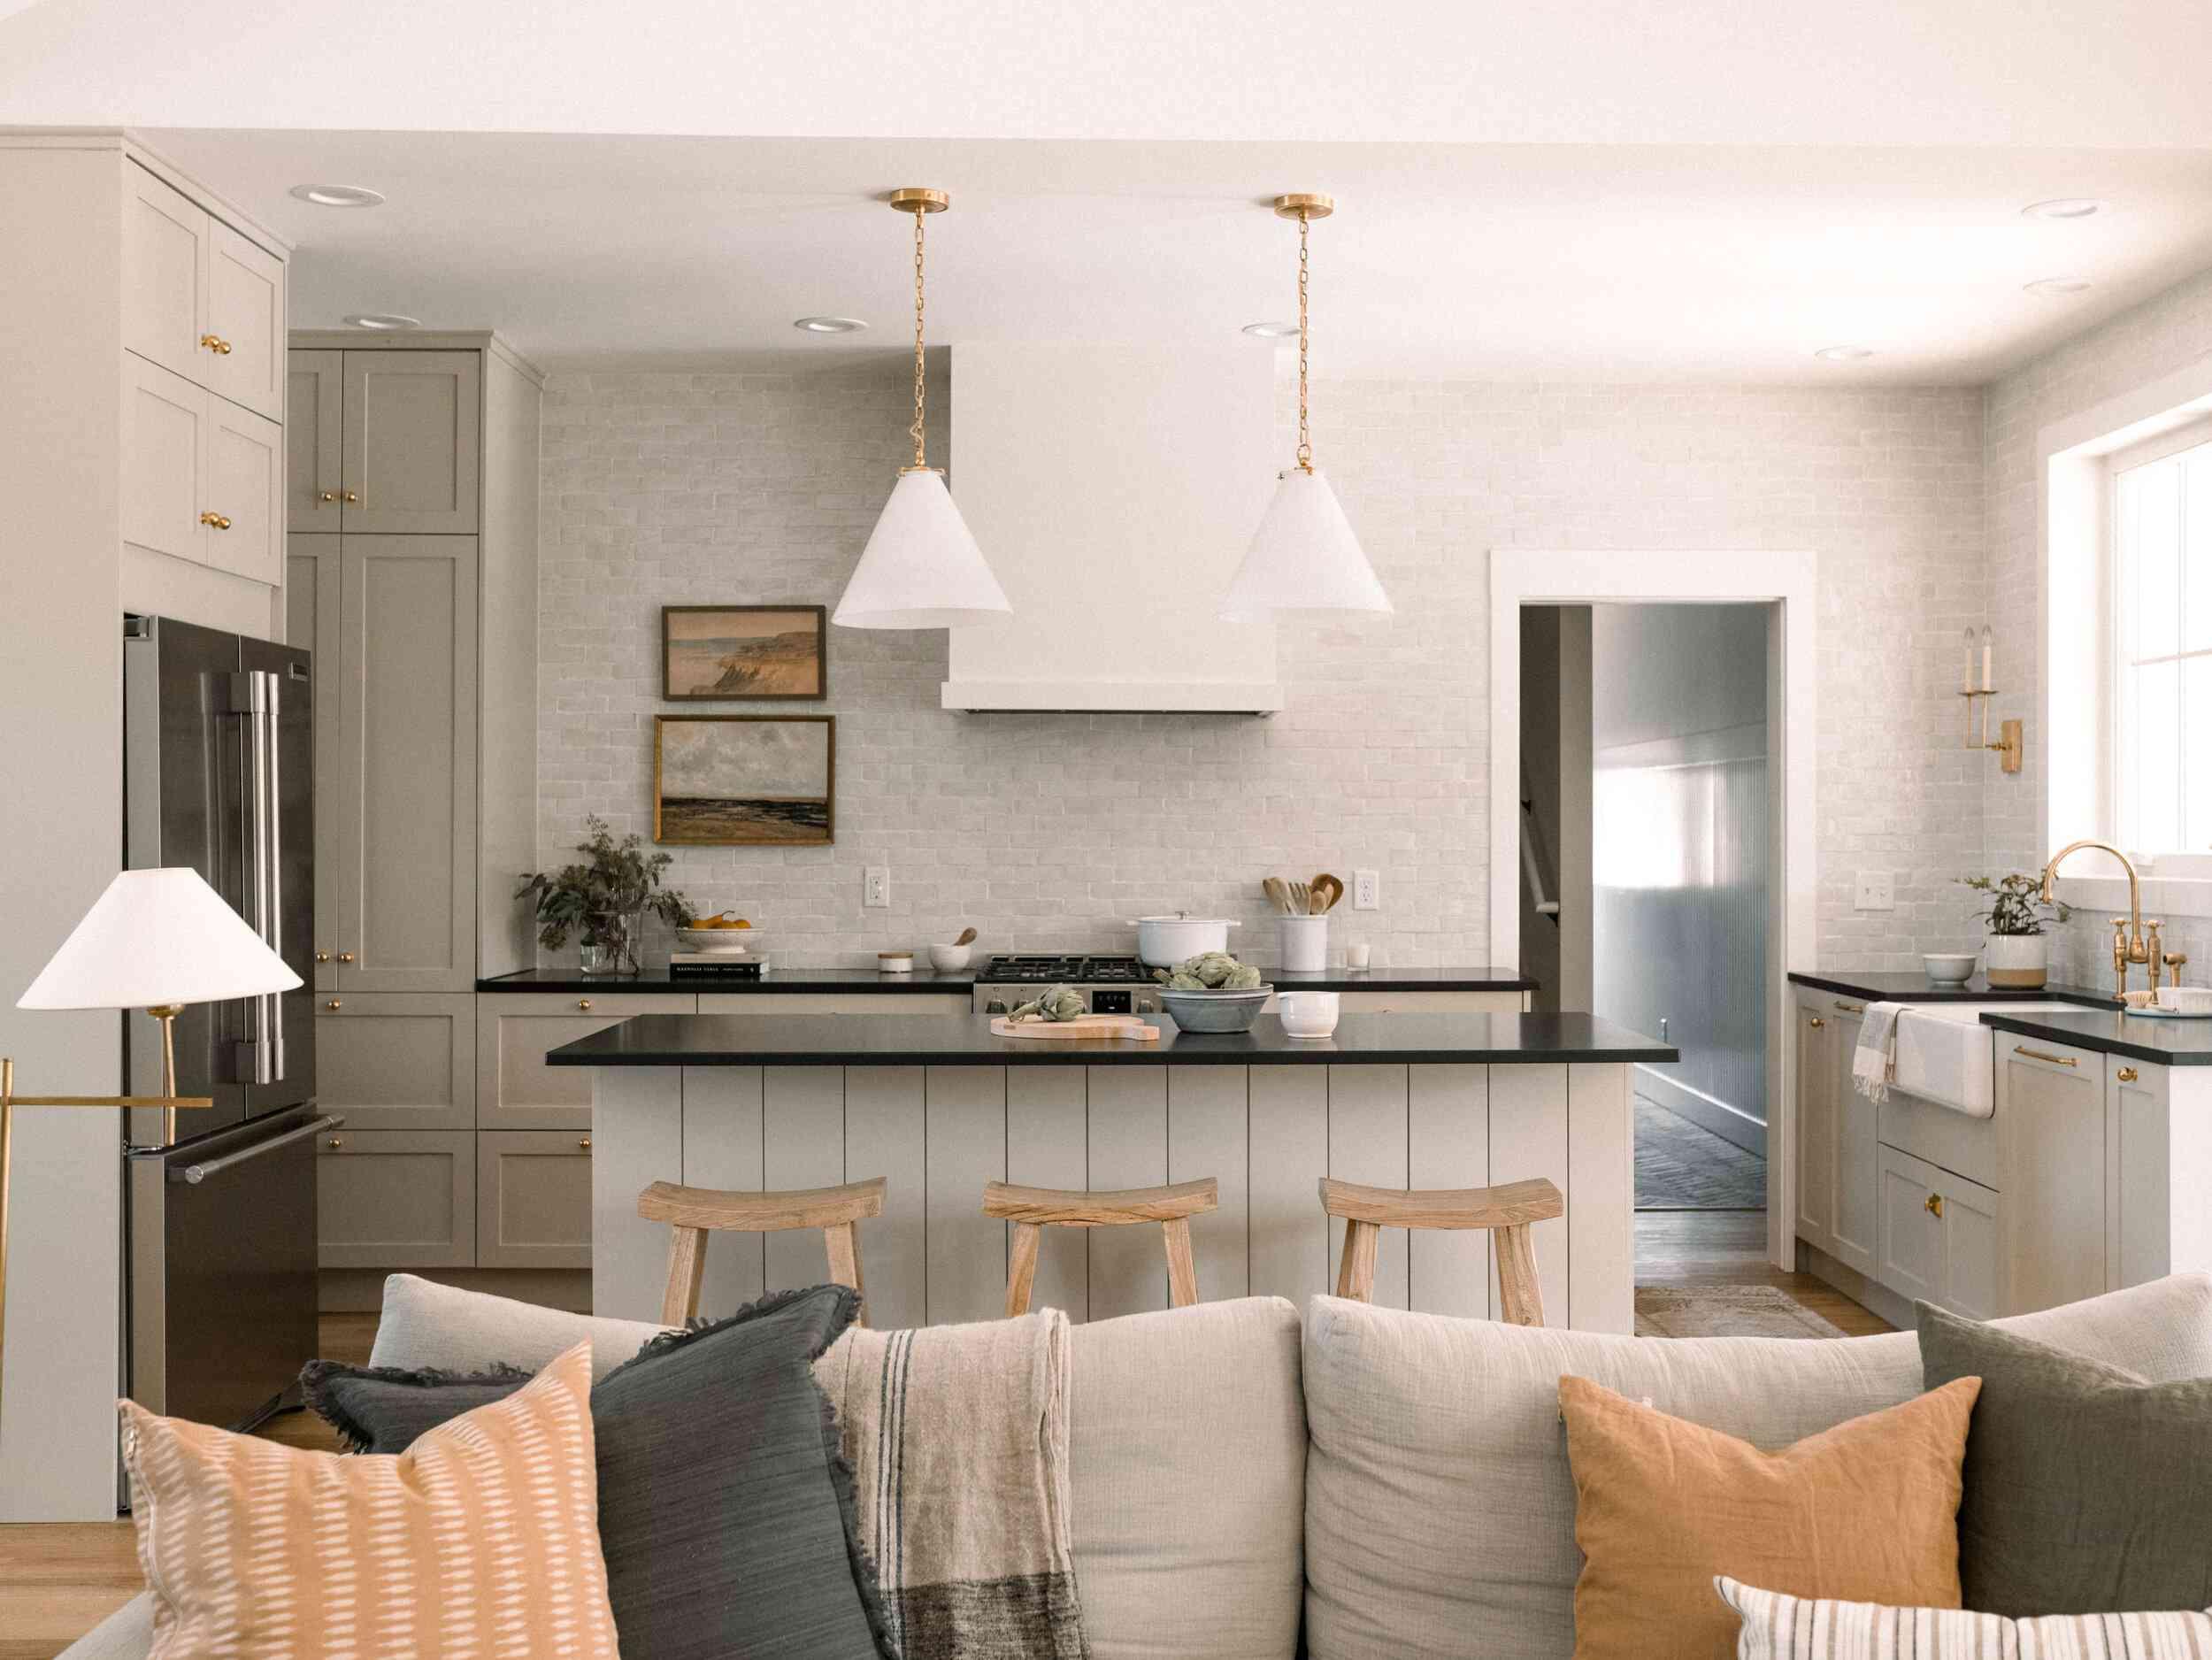 best kitchen ideas - earthy kitchen with standalone island